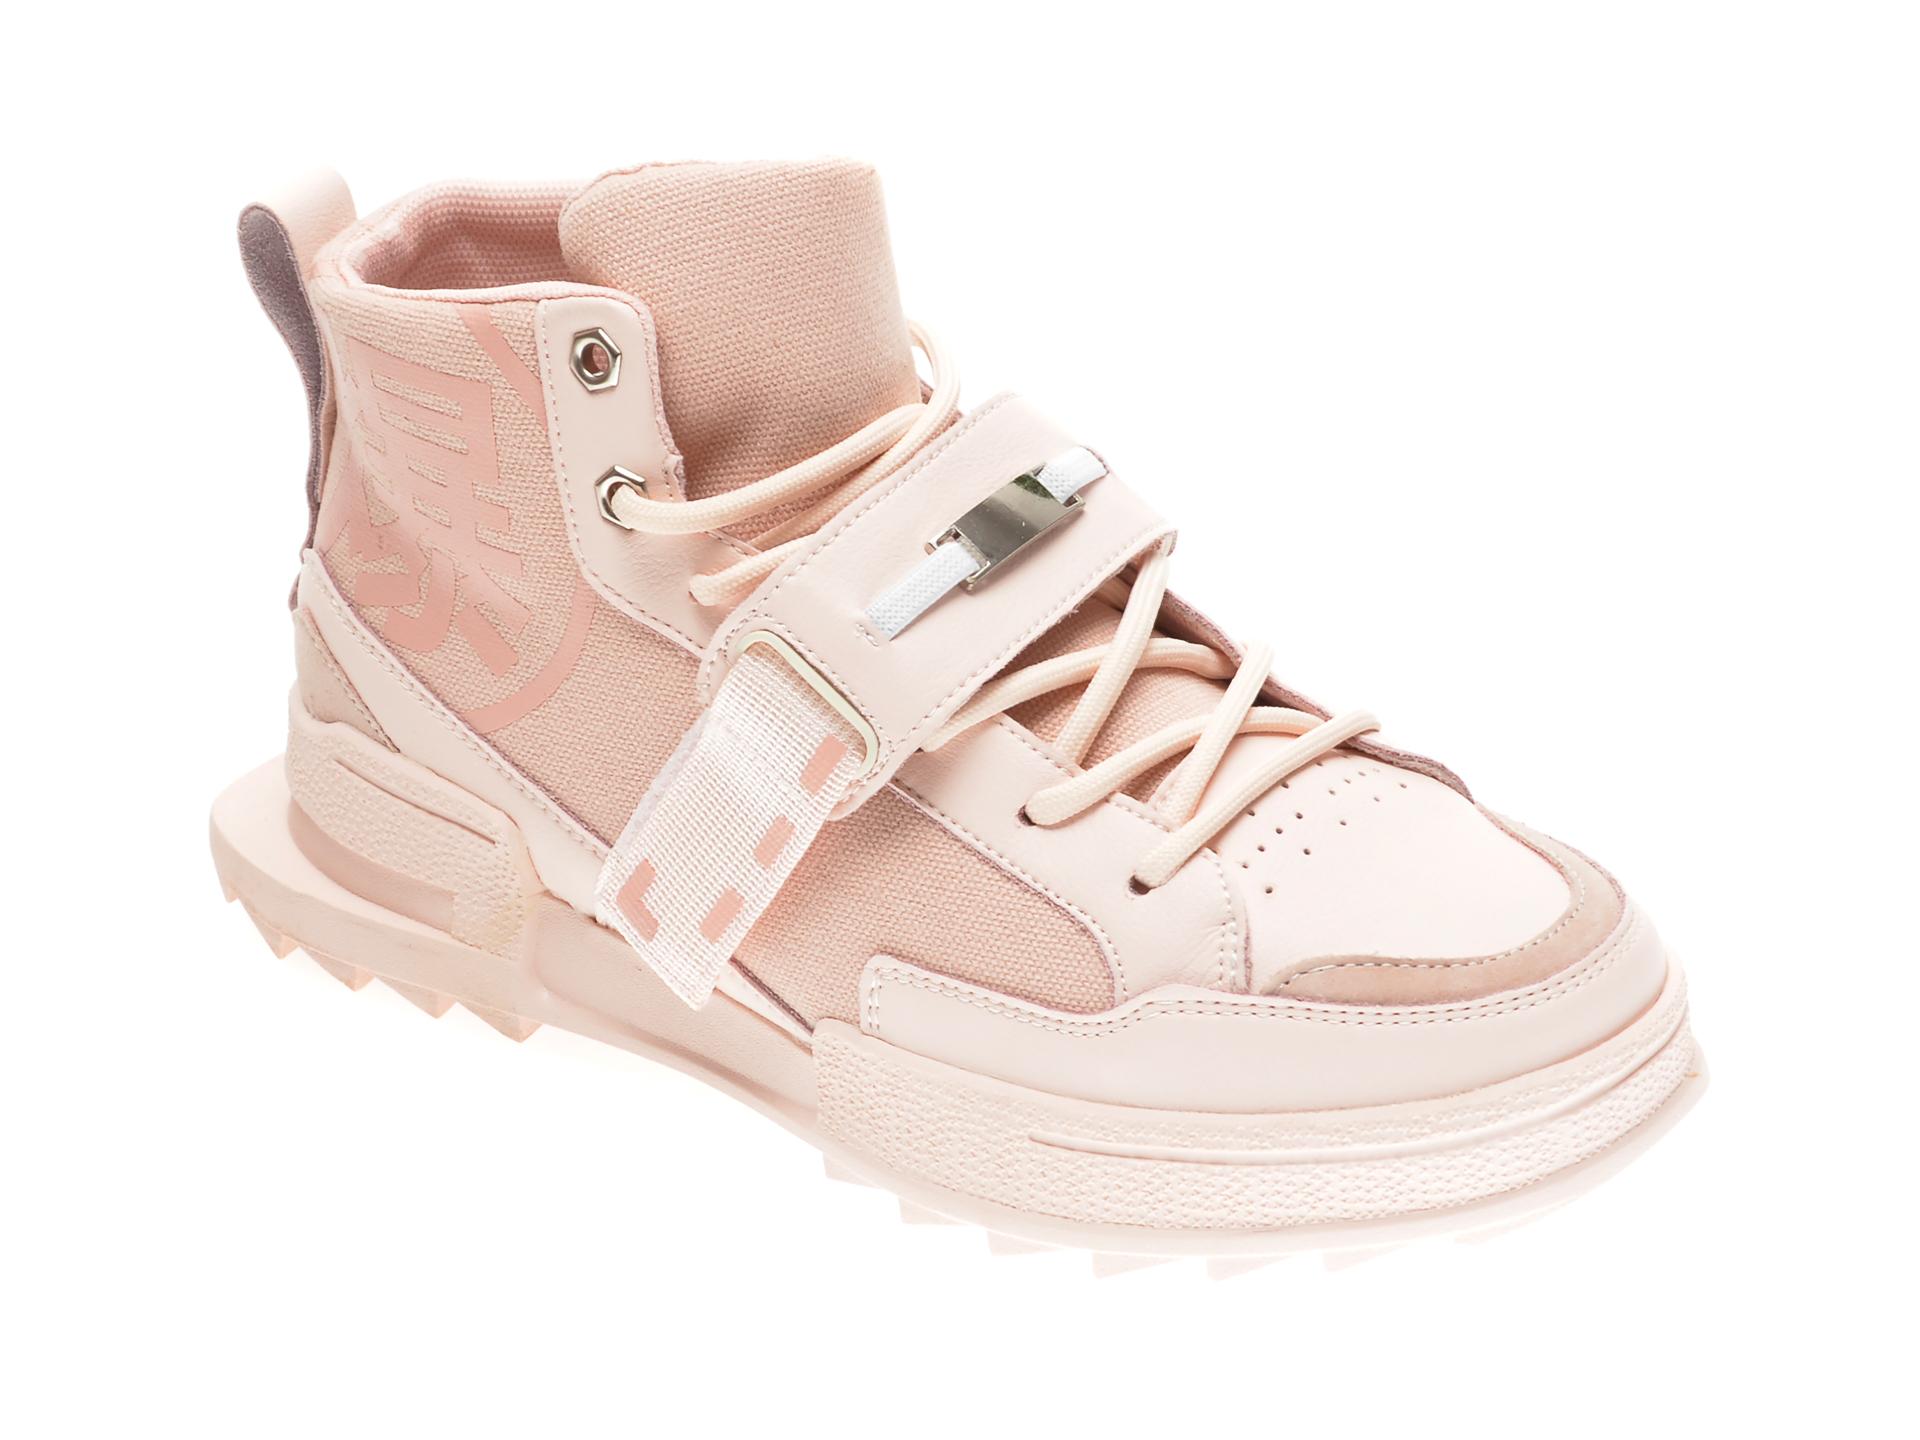 Ghete GRYXX roz, 3531, din material textil si piele naturala